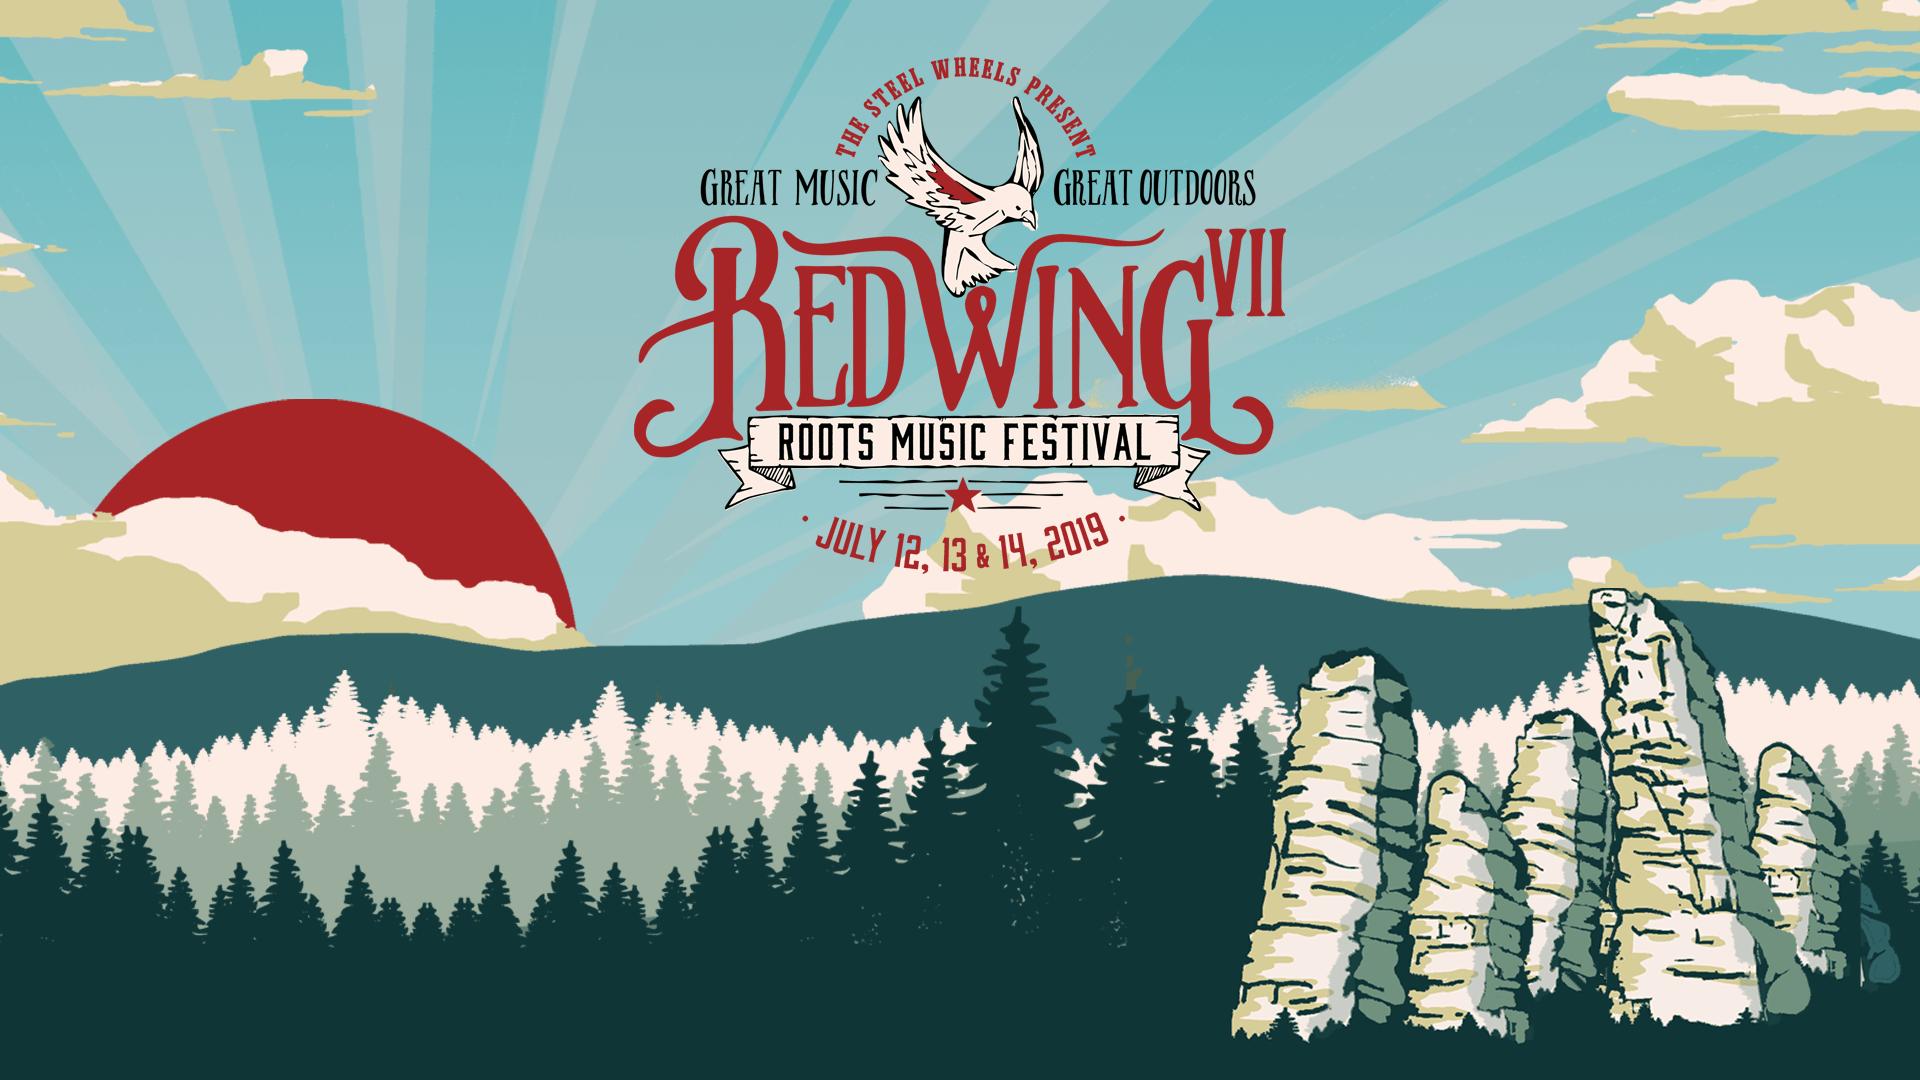 RedWing Roots Music Festival - Virginia Summer Music Festivals